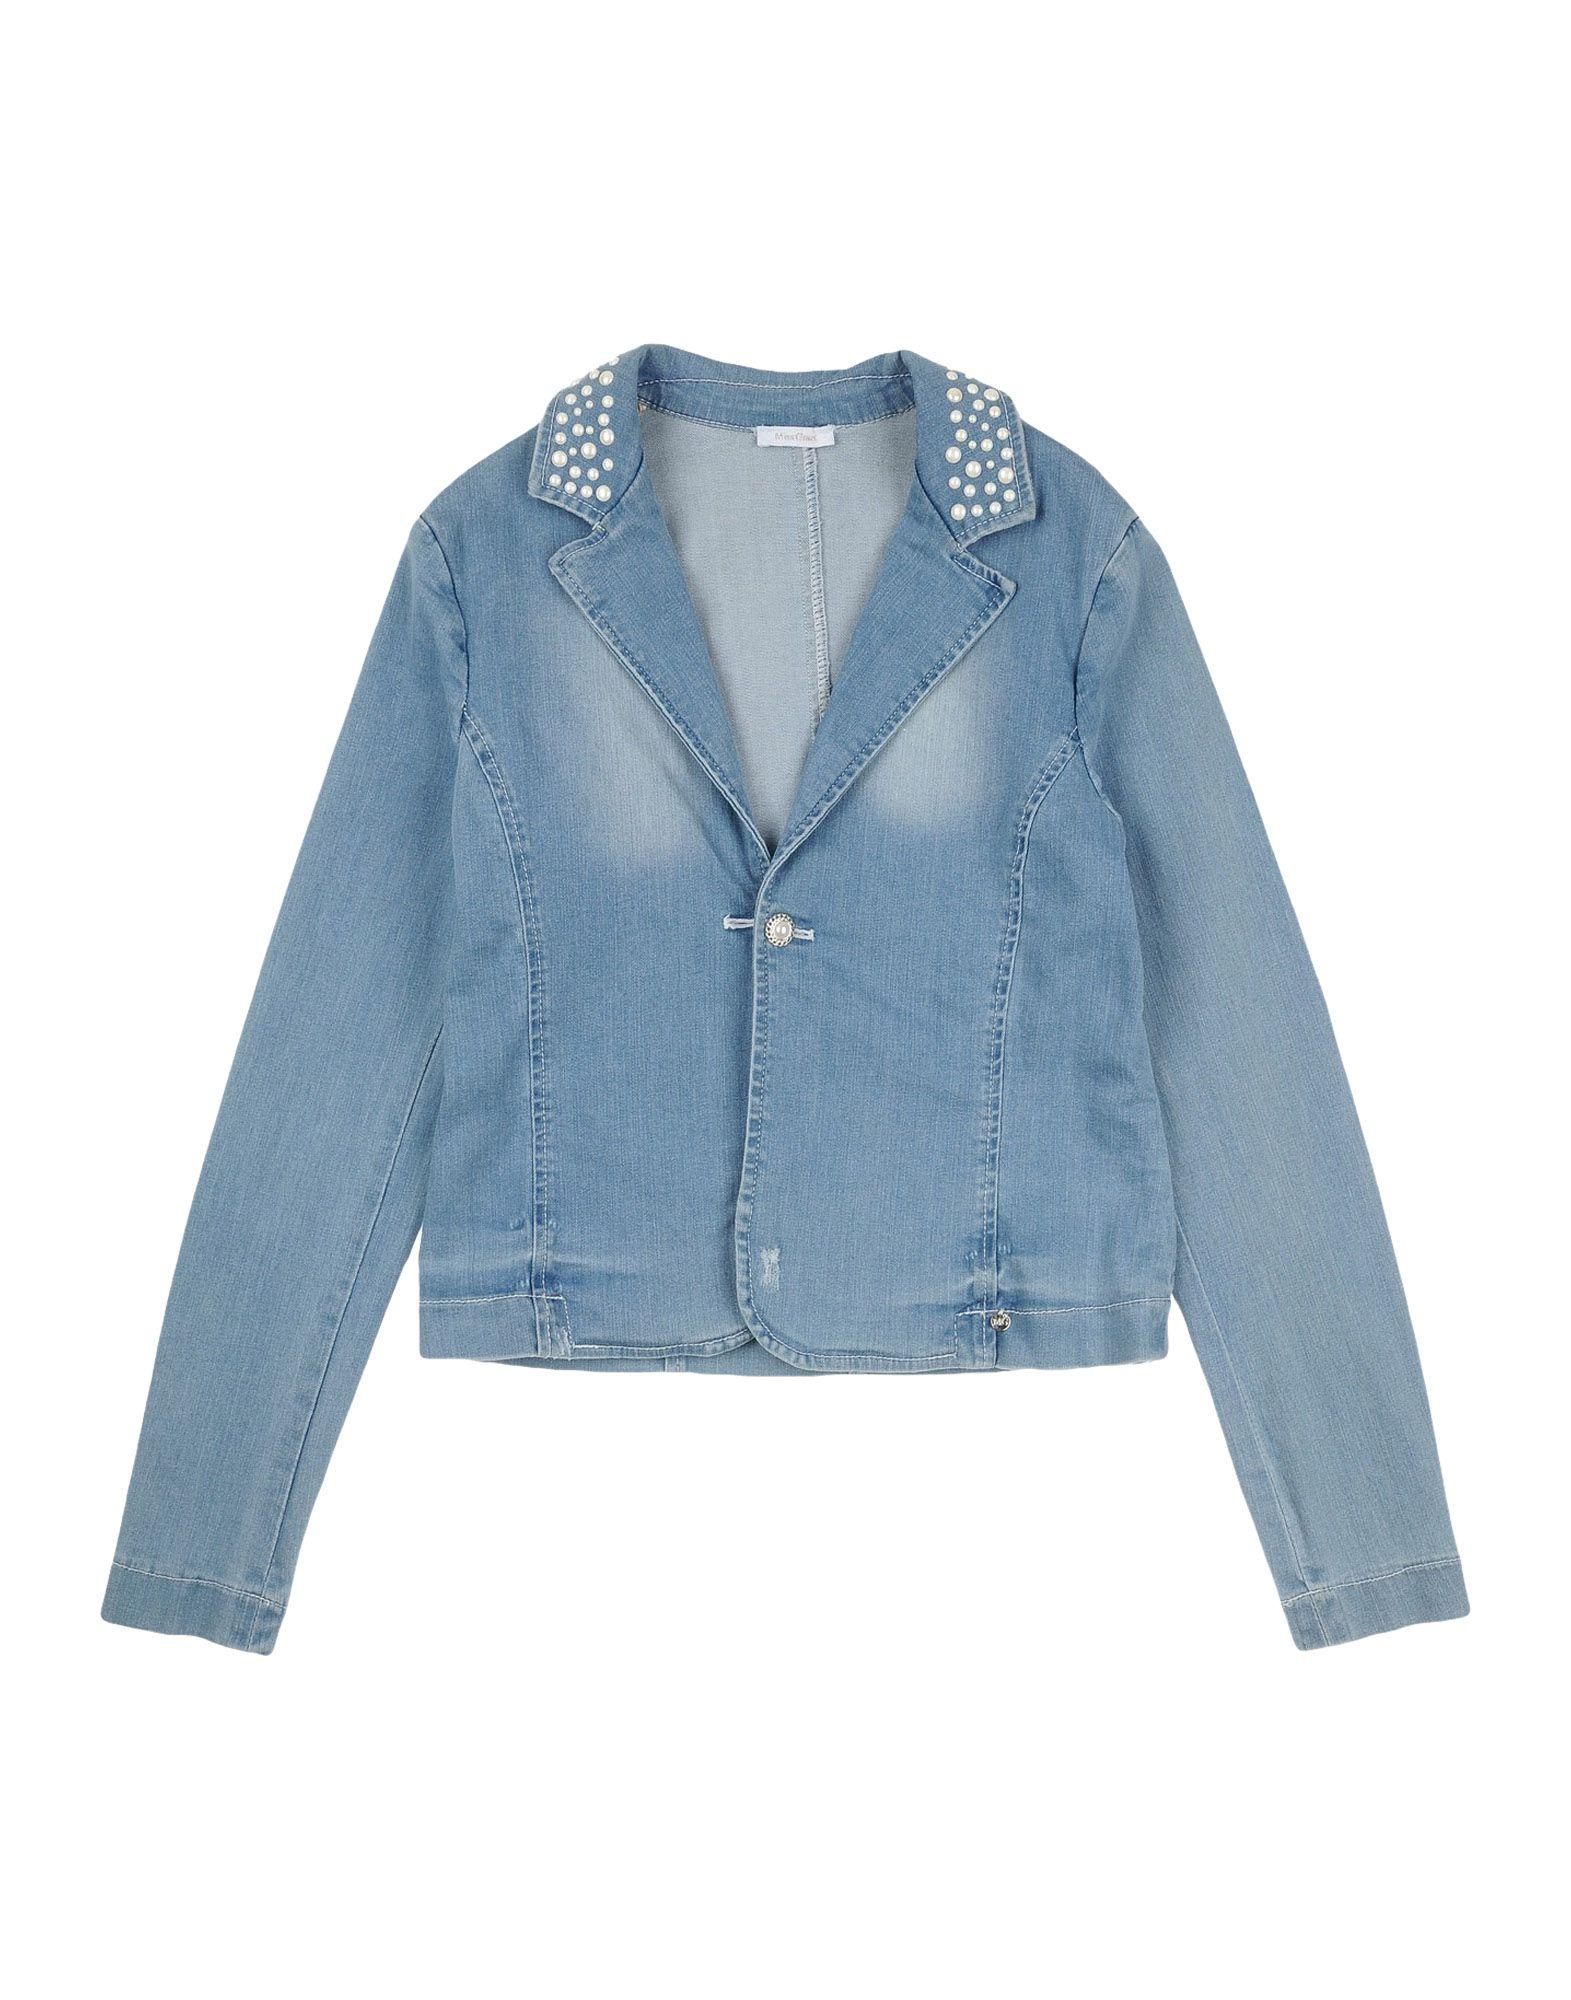 Фото - MISS GRANT Джинсовая верхняя одежда microbe by miss grant джинсовая верхняя одежда